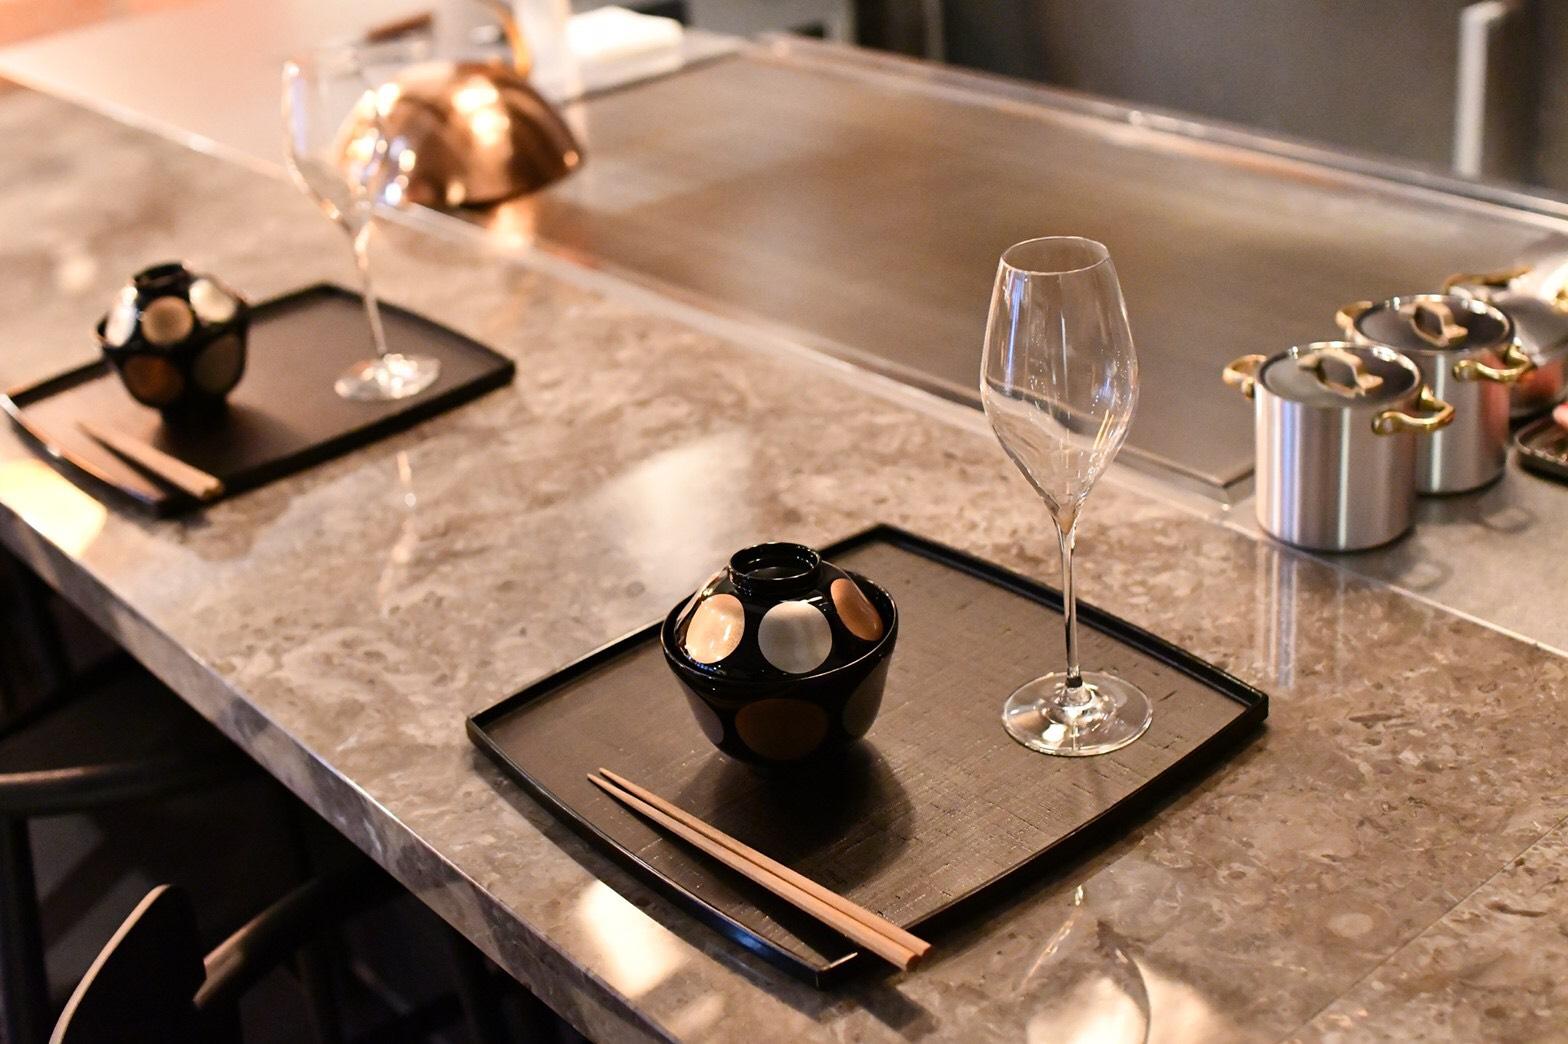 Chef's Table at Margotto(マルゴット)の1枚目のカバー写真